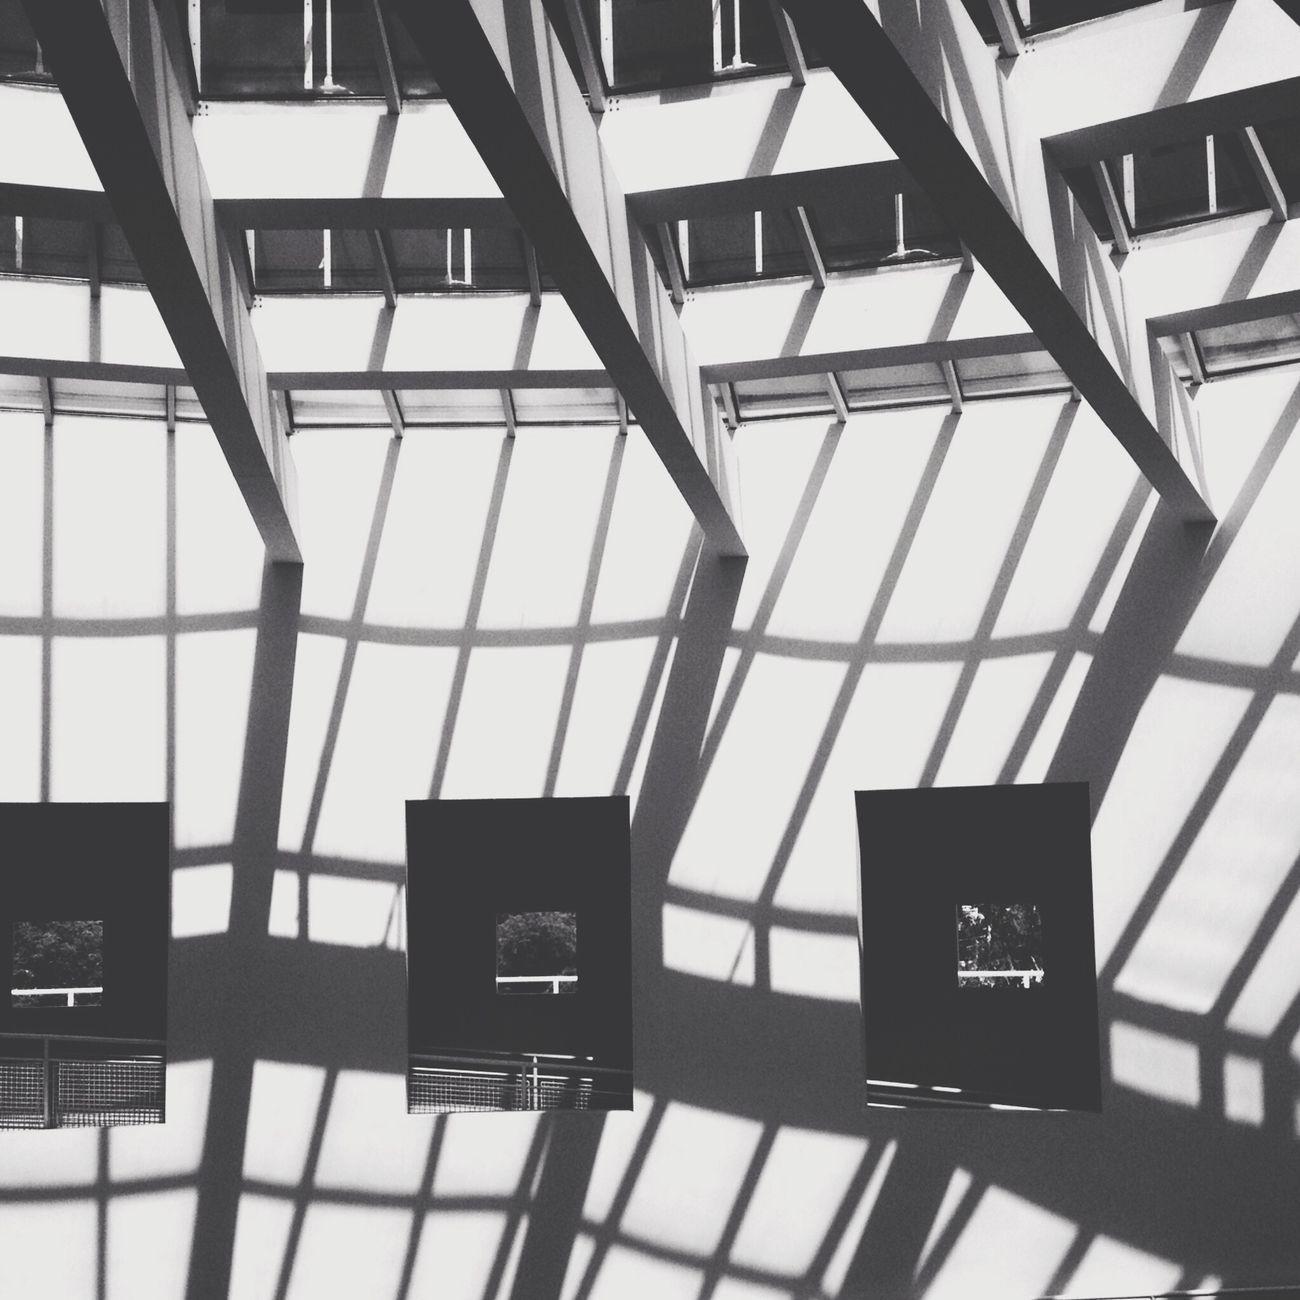 Blackandwhite Monochrome Architecture Architectural Detail